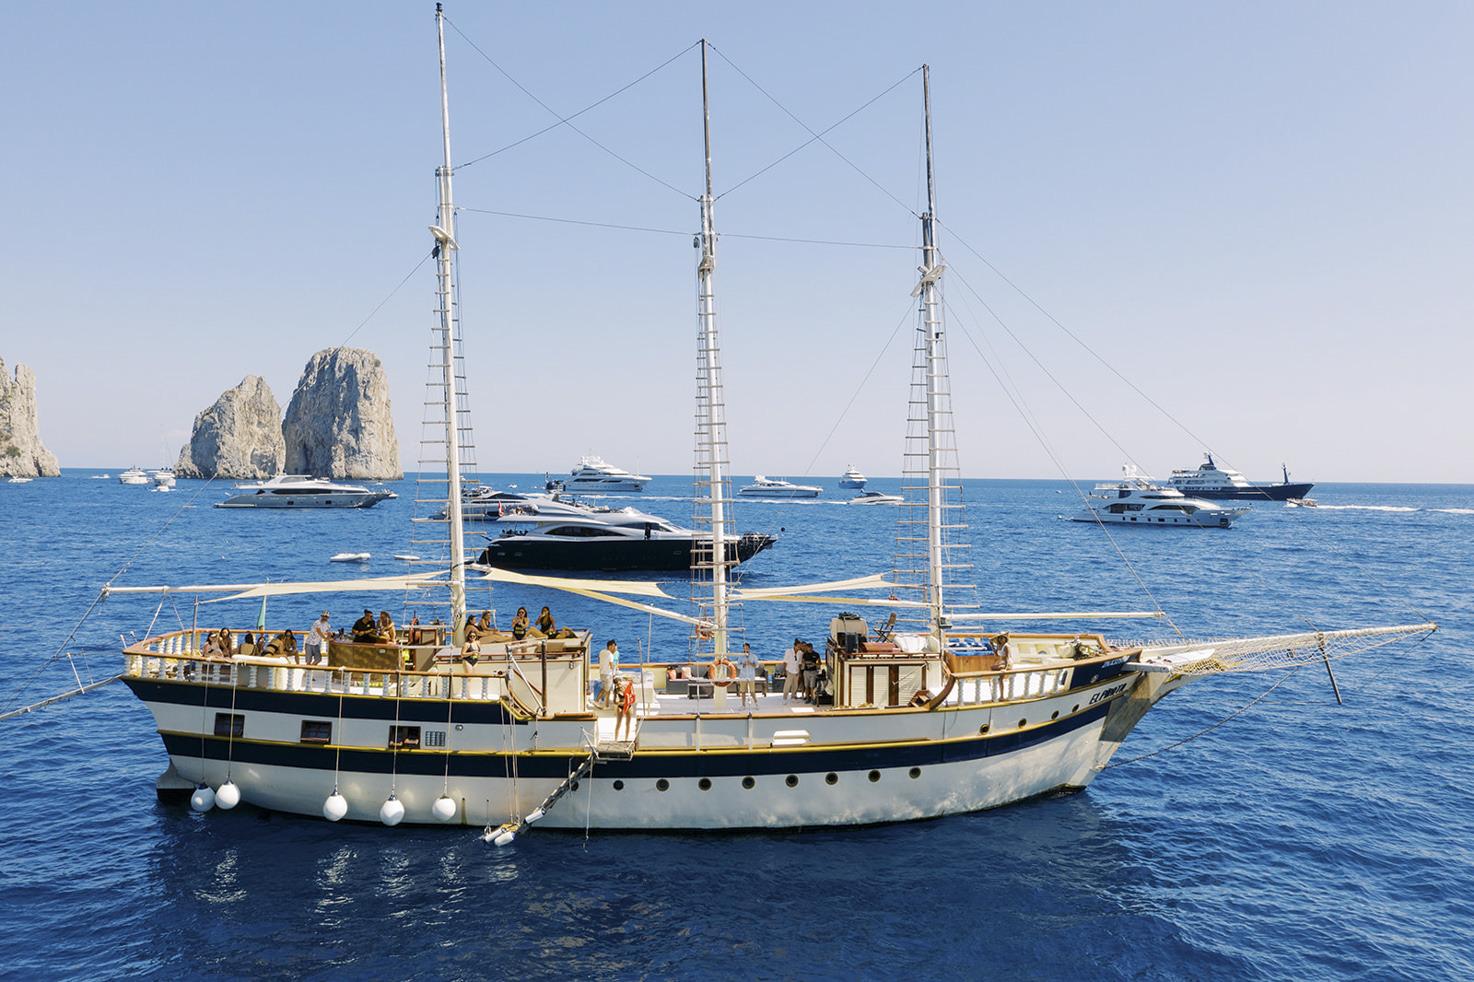 Boat tour in Capri & Amalfi Coast